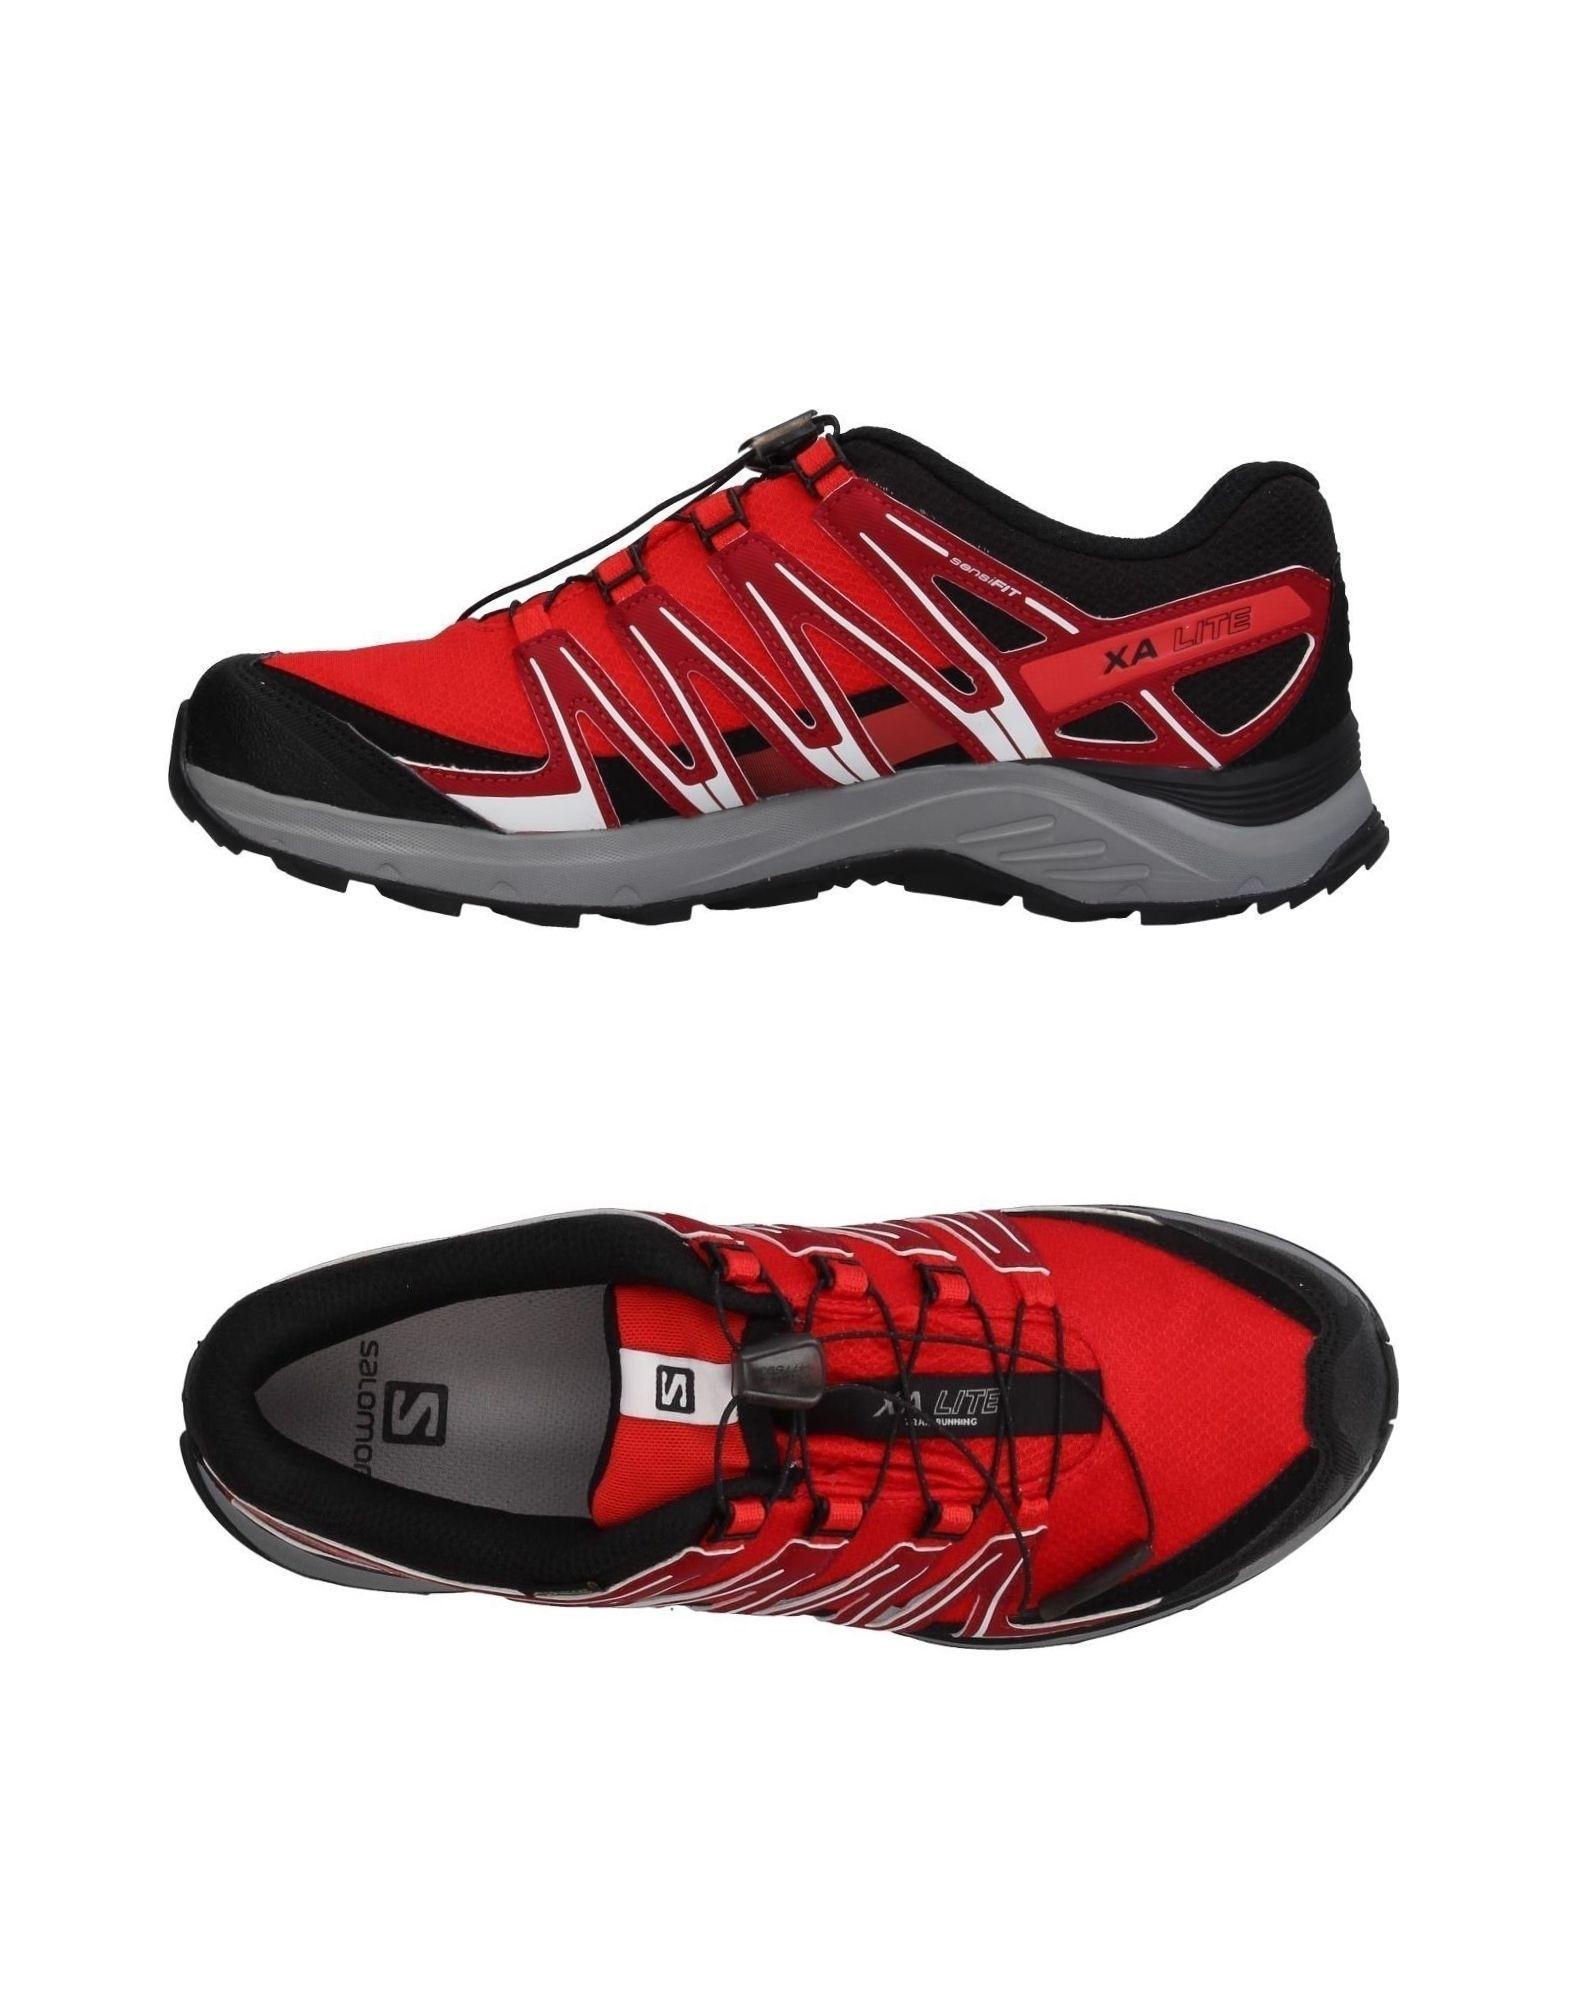 Sneakers Salomon Uomo - Acquista online su